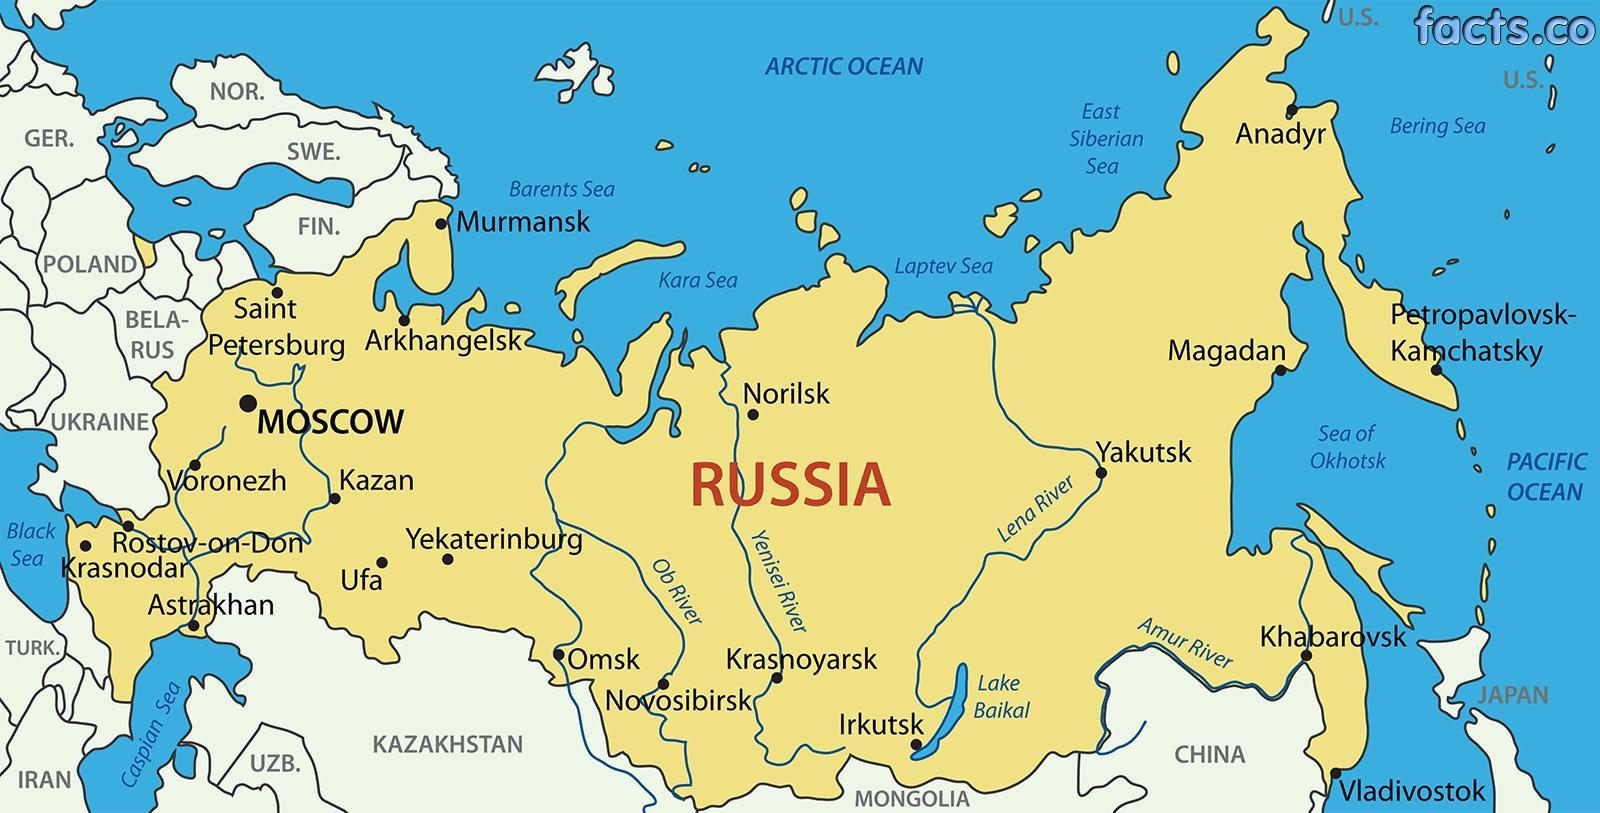 karta rusije Karta Rusije s natpisom   s natpisom karta Rusije (Istočna Europa  karta rusije